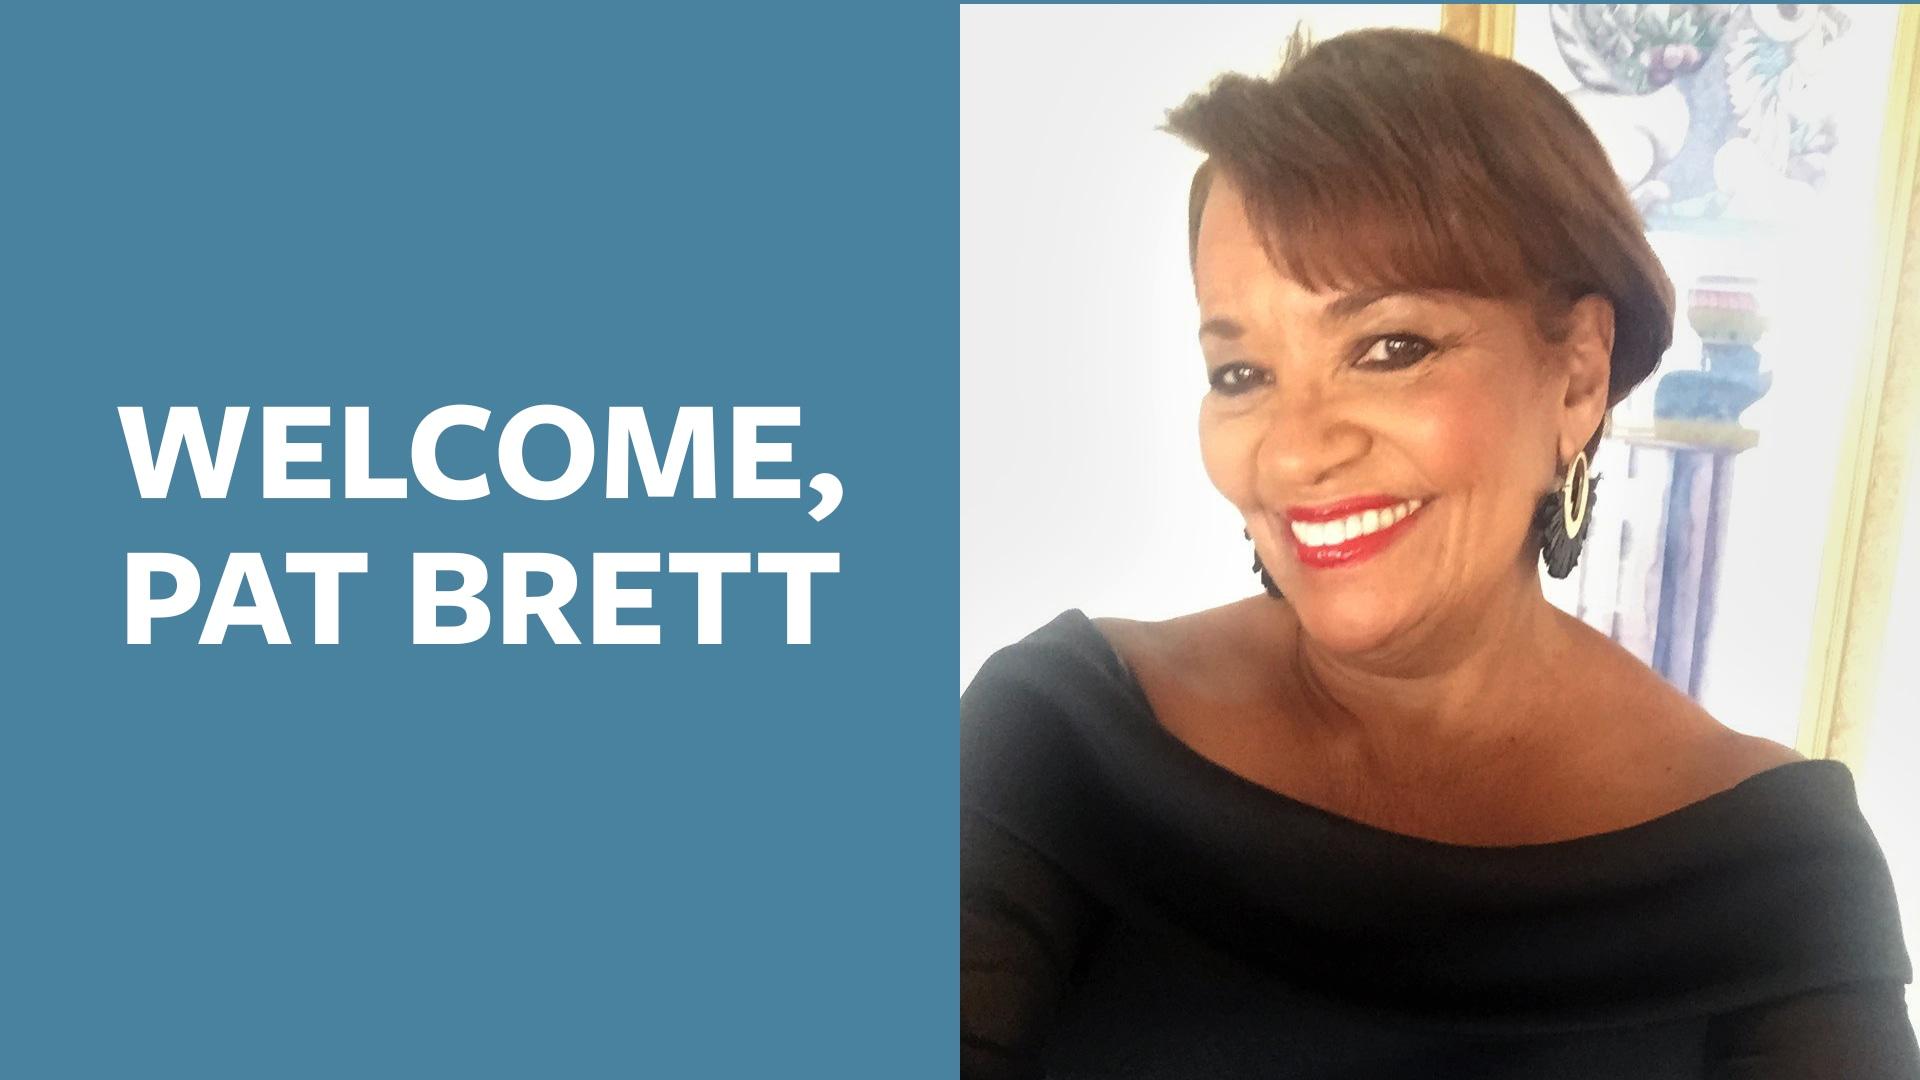 Welcome, Pat Brett